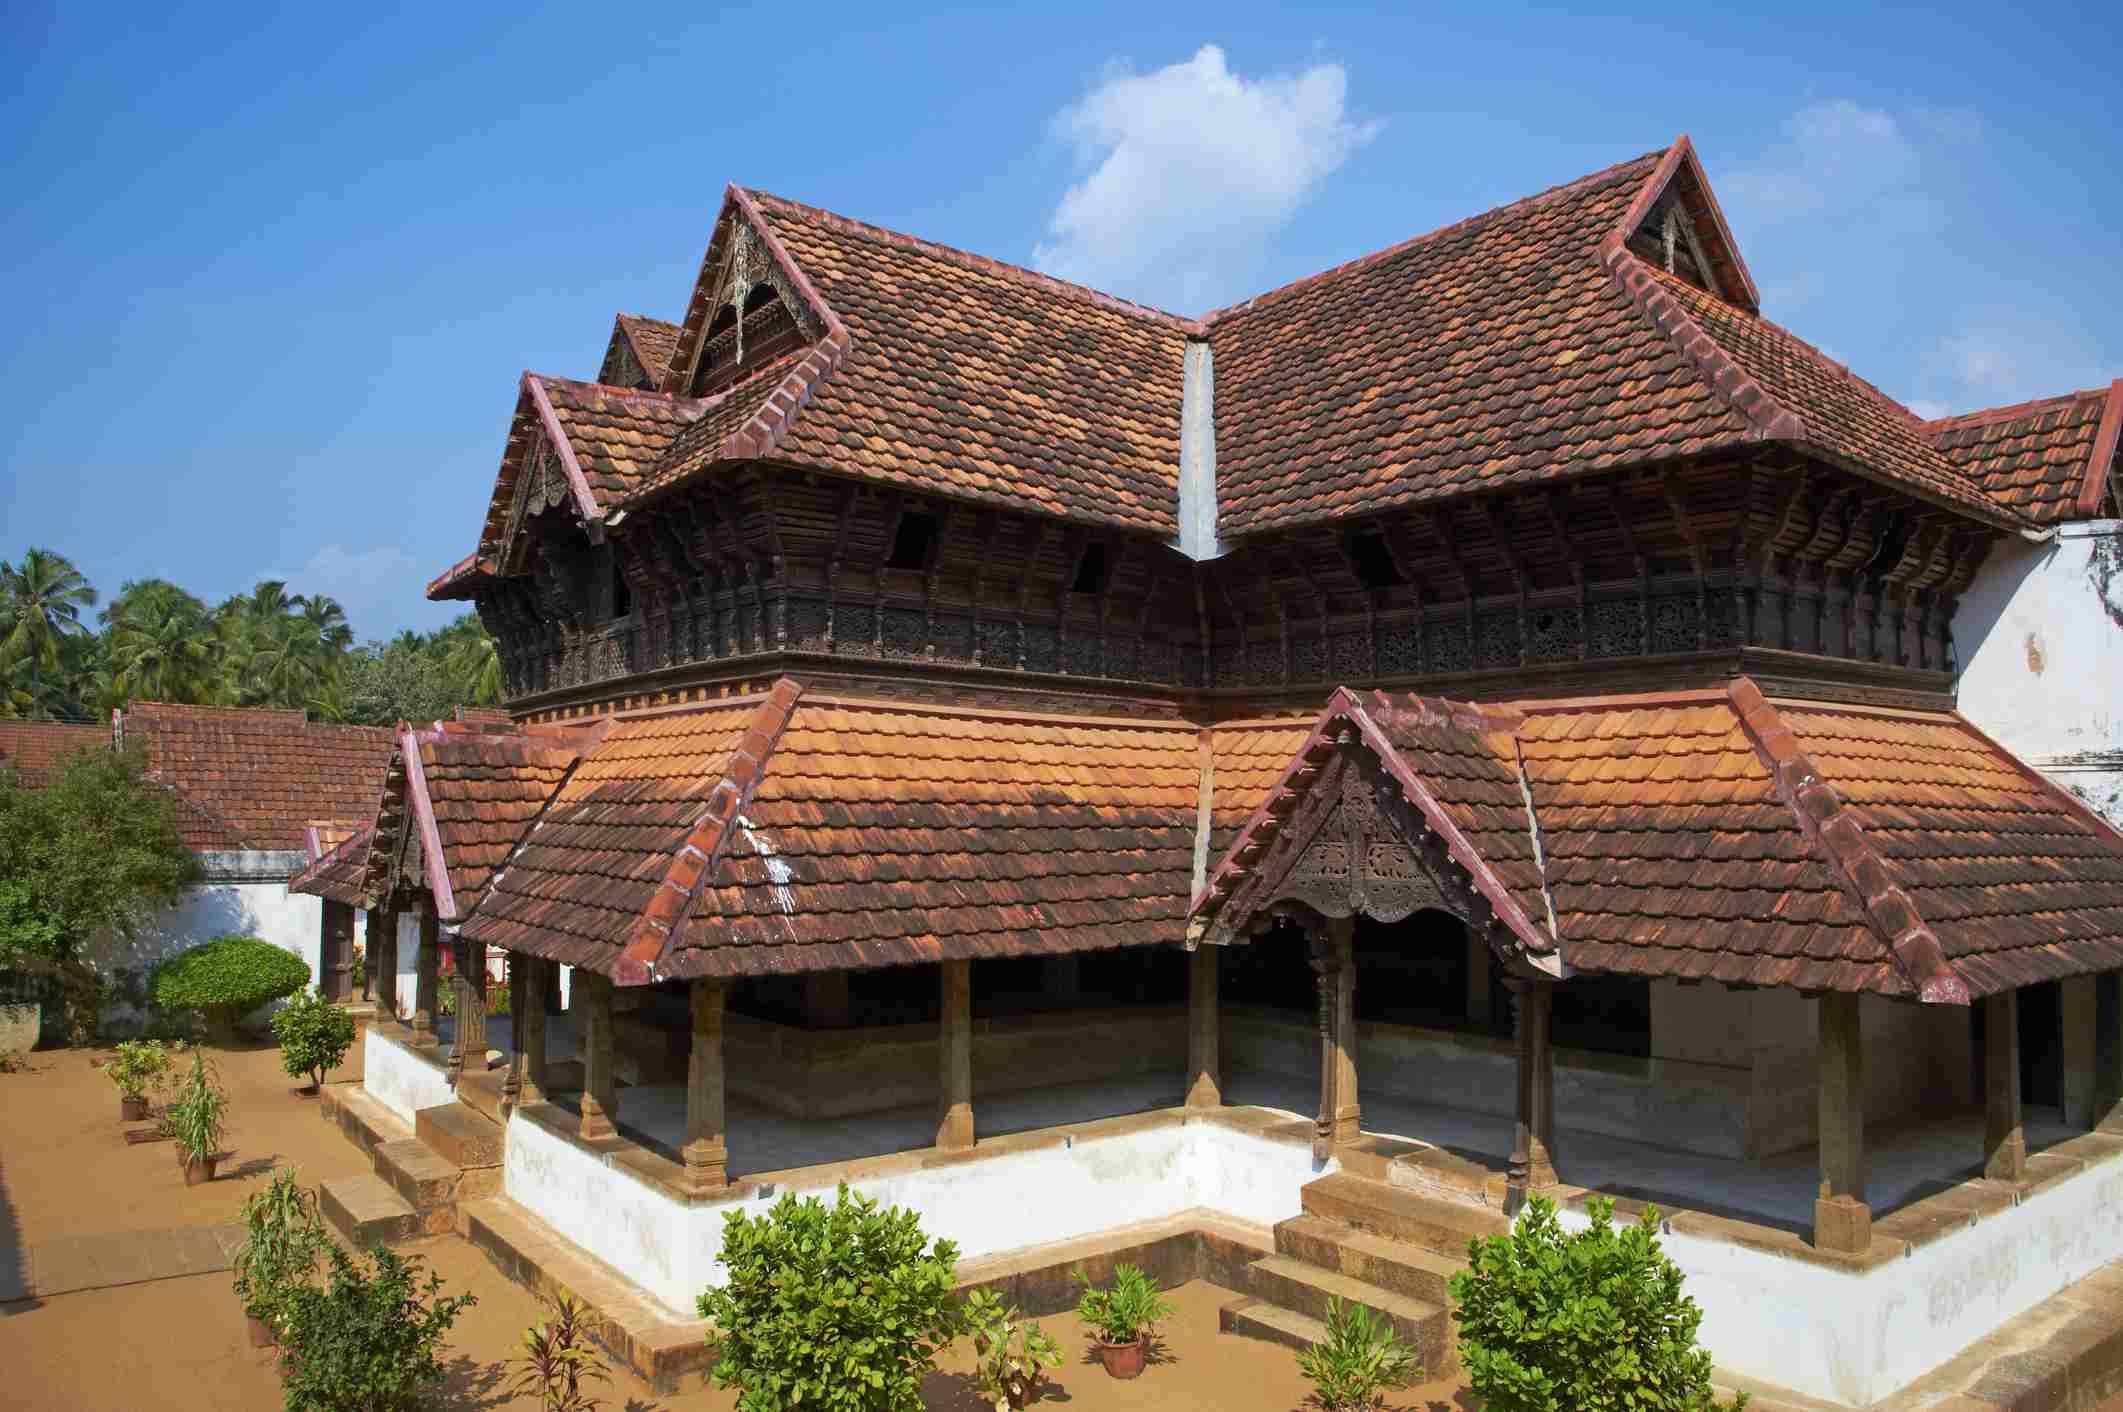 settings Padmanabhapuram palace, the biggest wooden palace in Asia